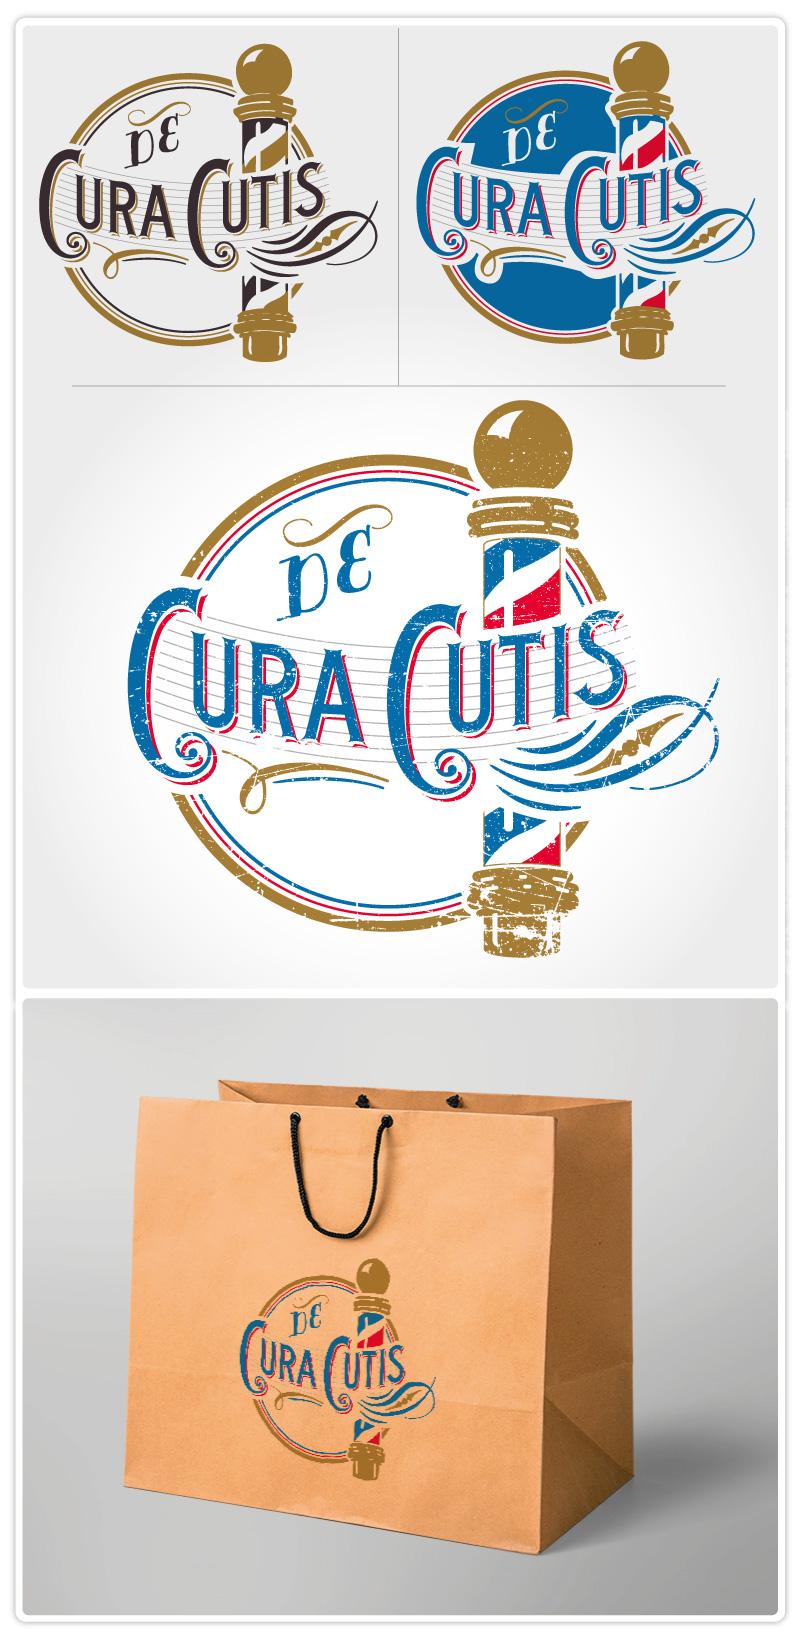 De Cura Cutis logo